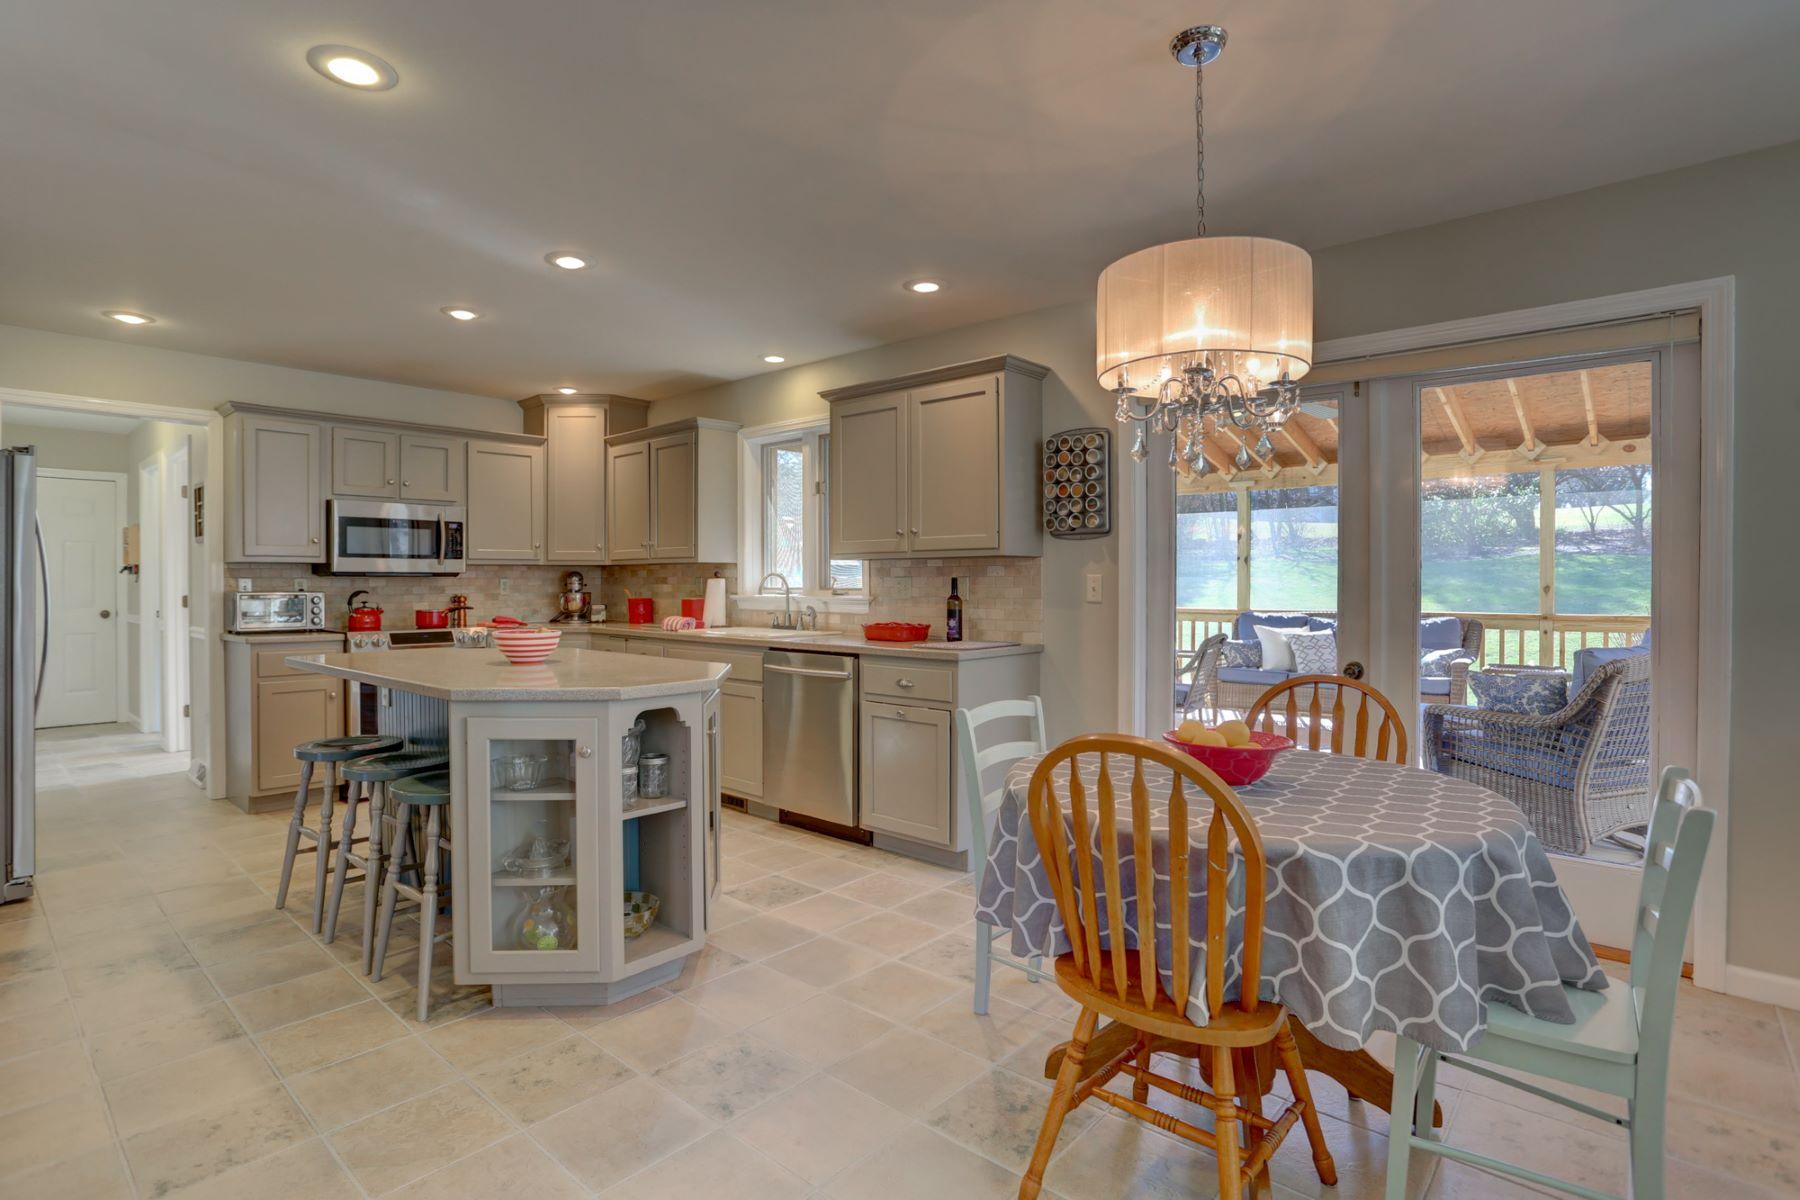 Additional photo for property listing at 95 Leaman Road 95 Leaman Road Lancaster, Pennsylvania 17603 Estados Unidos